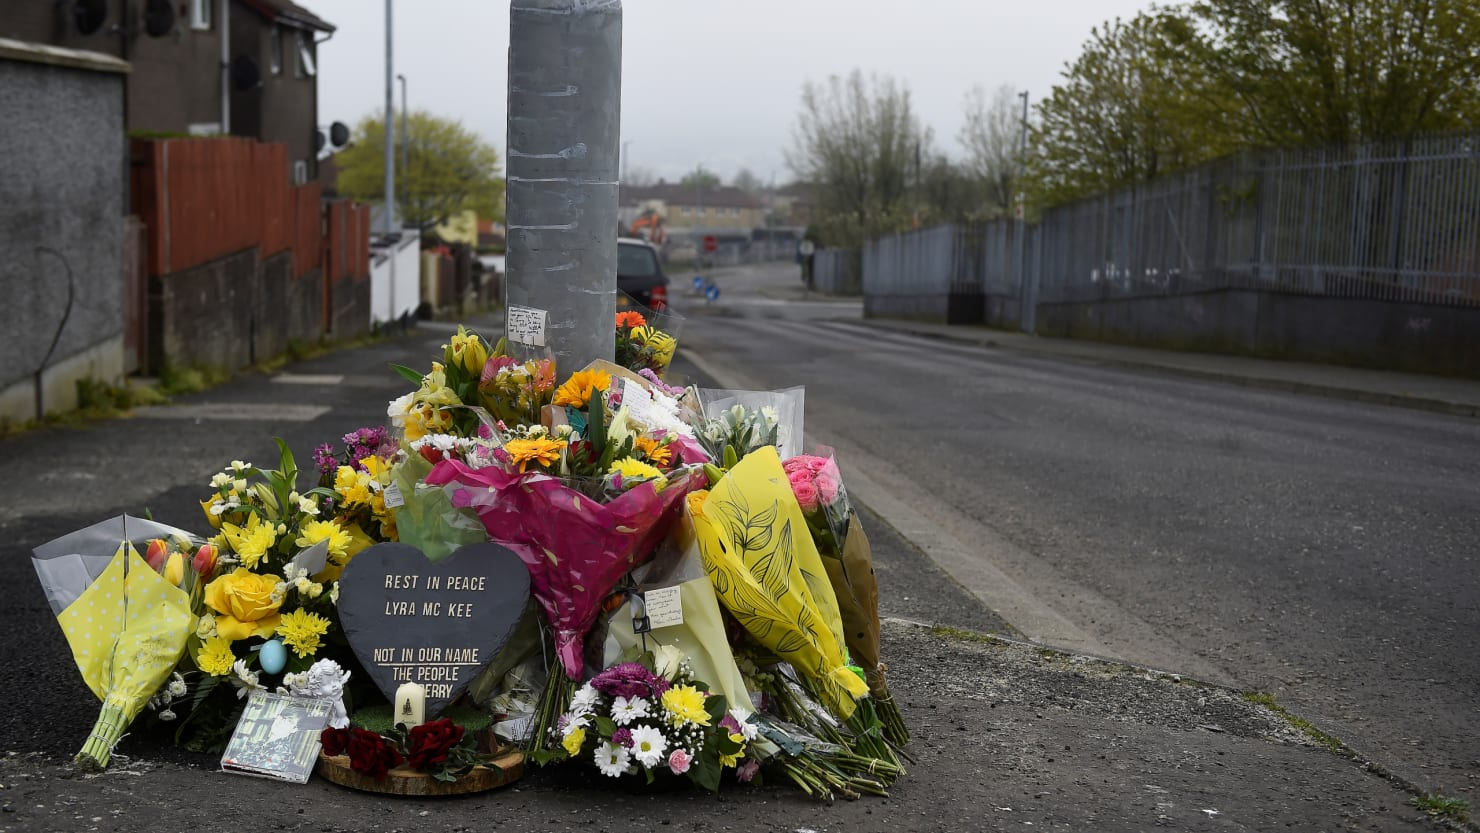 New IRA Takes Responsibility for Killing Journalist Lyra McKee